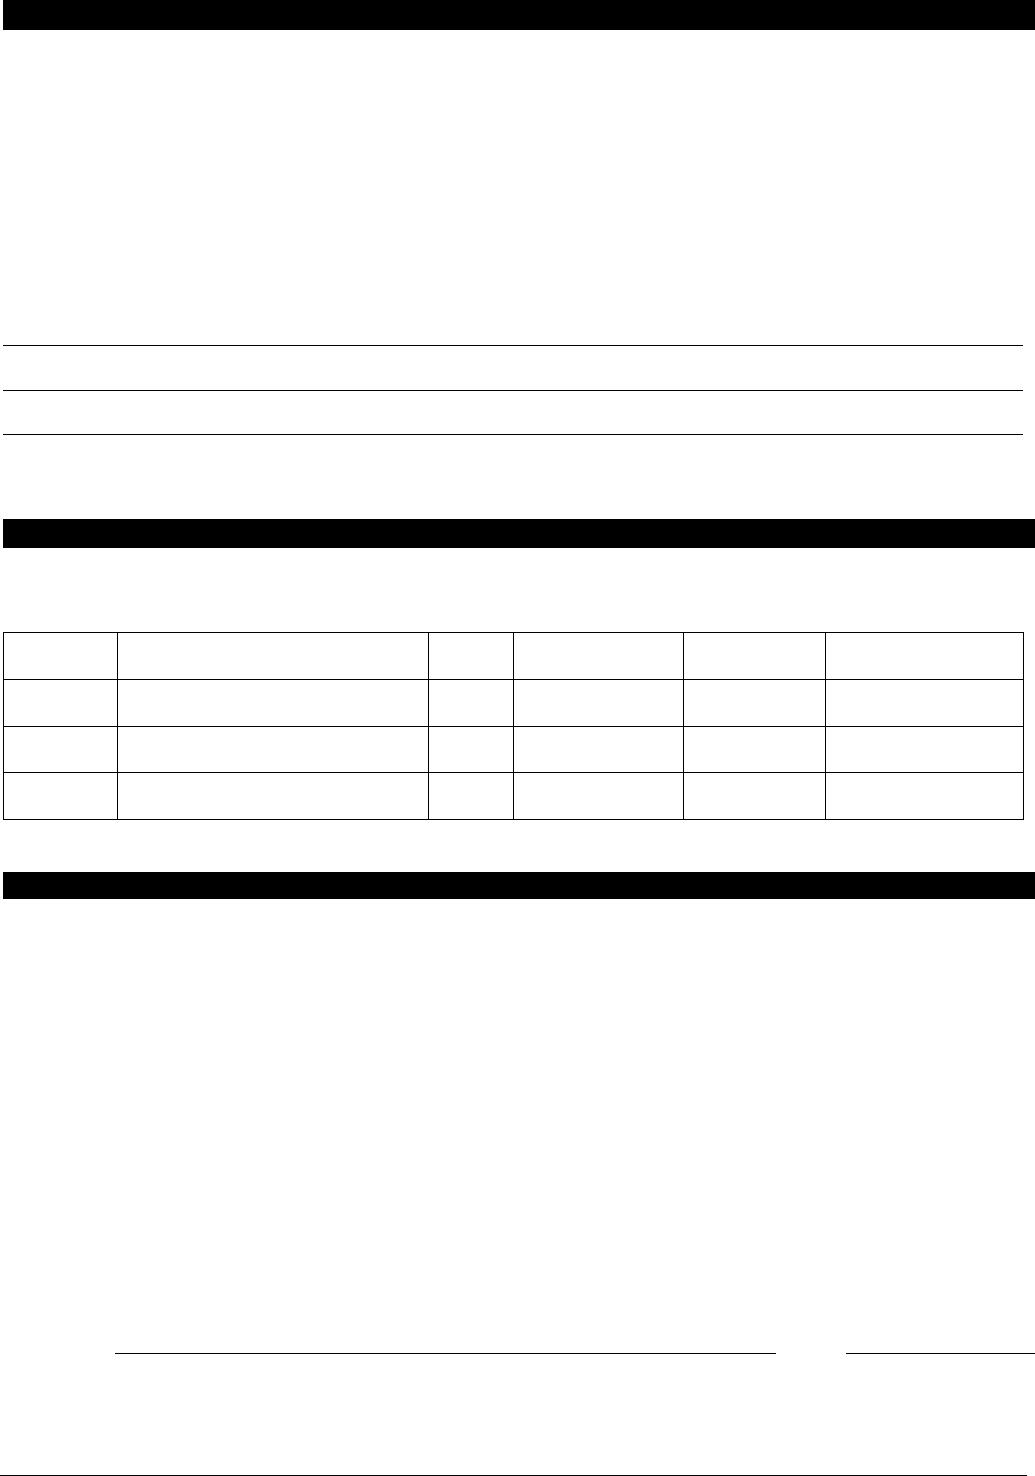 Free Printable Kmart Job Application Form Page 2